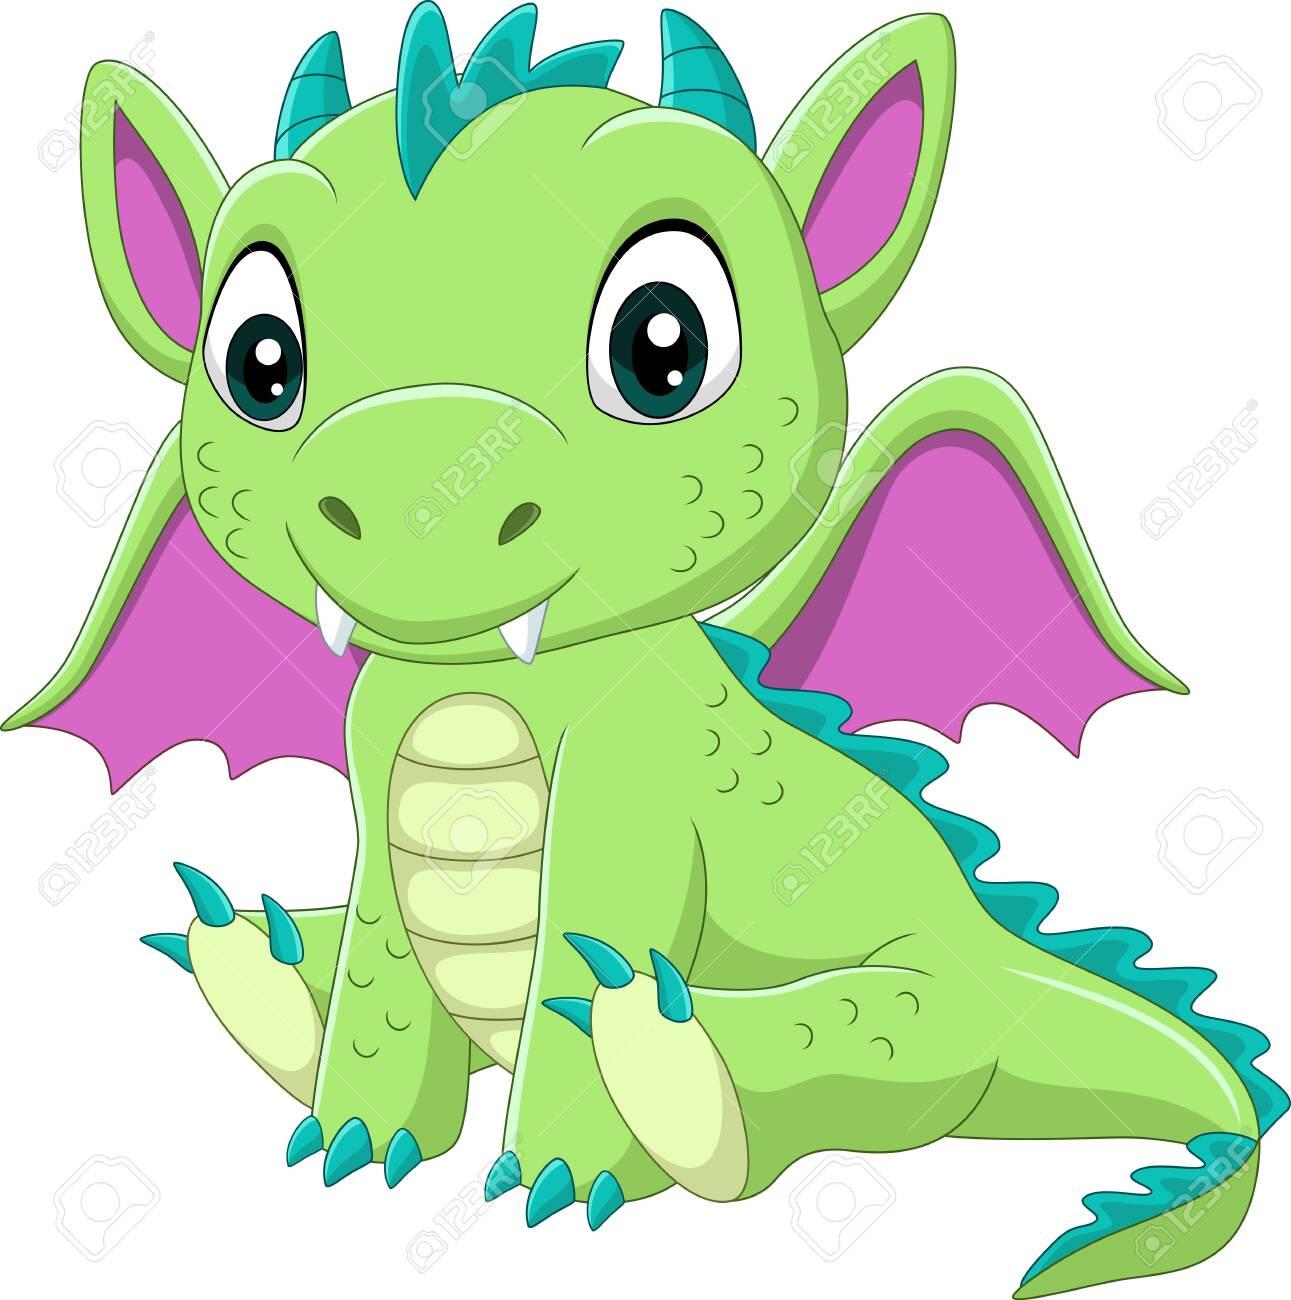 Vector illustration of Cartoon baby green dragon sitting - 140216928